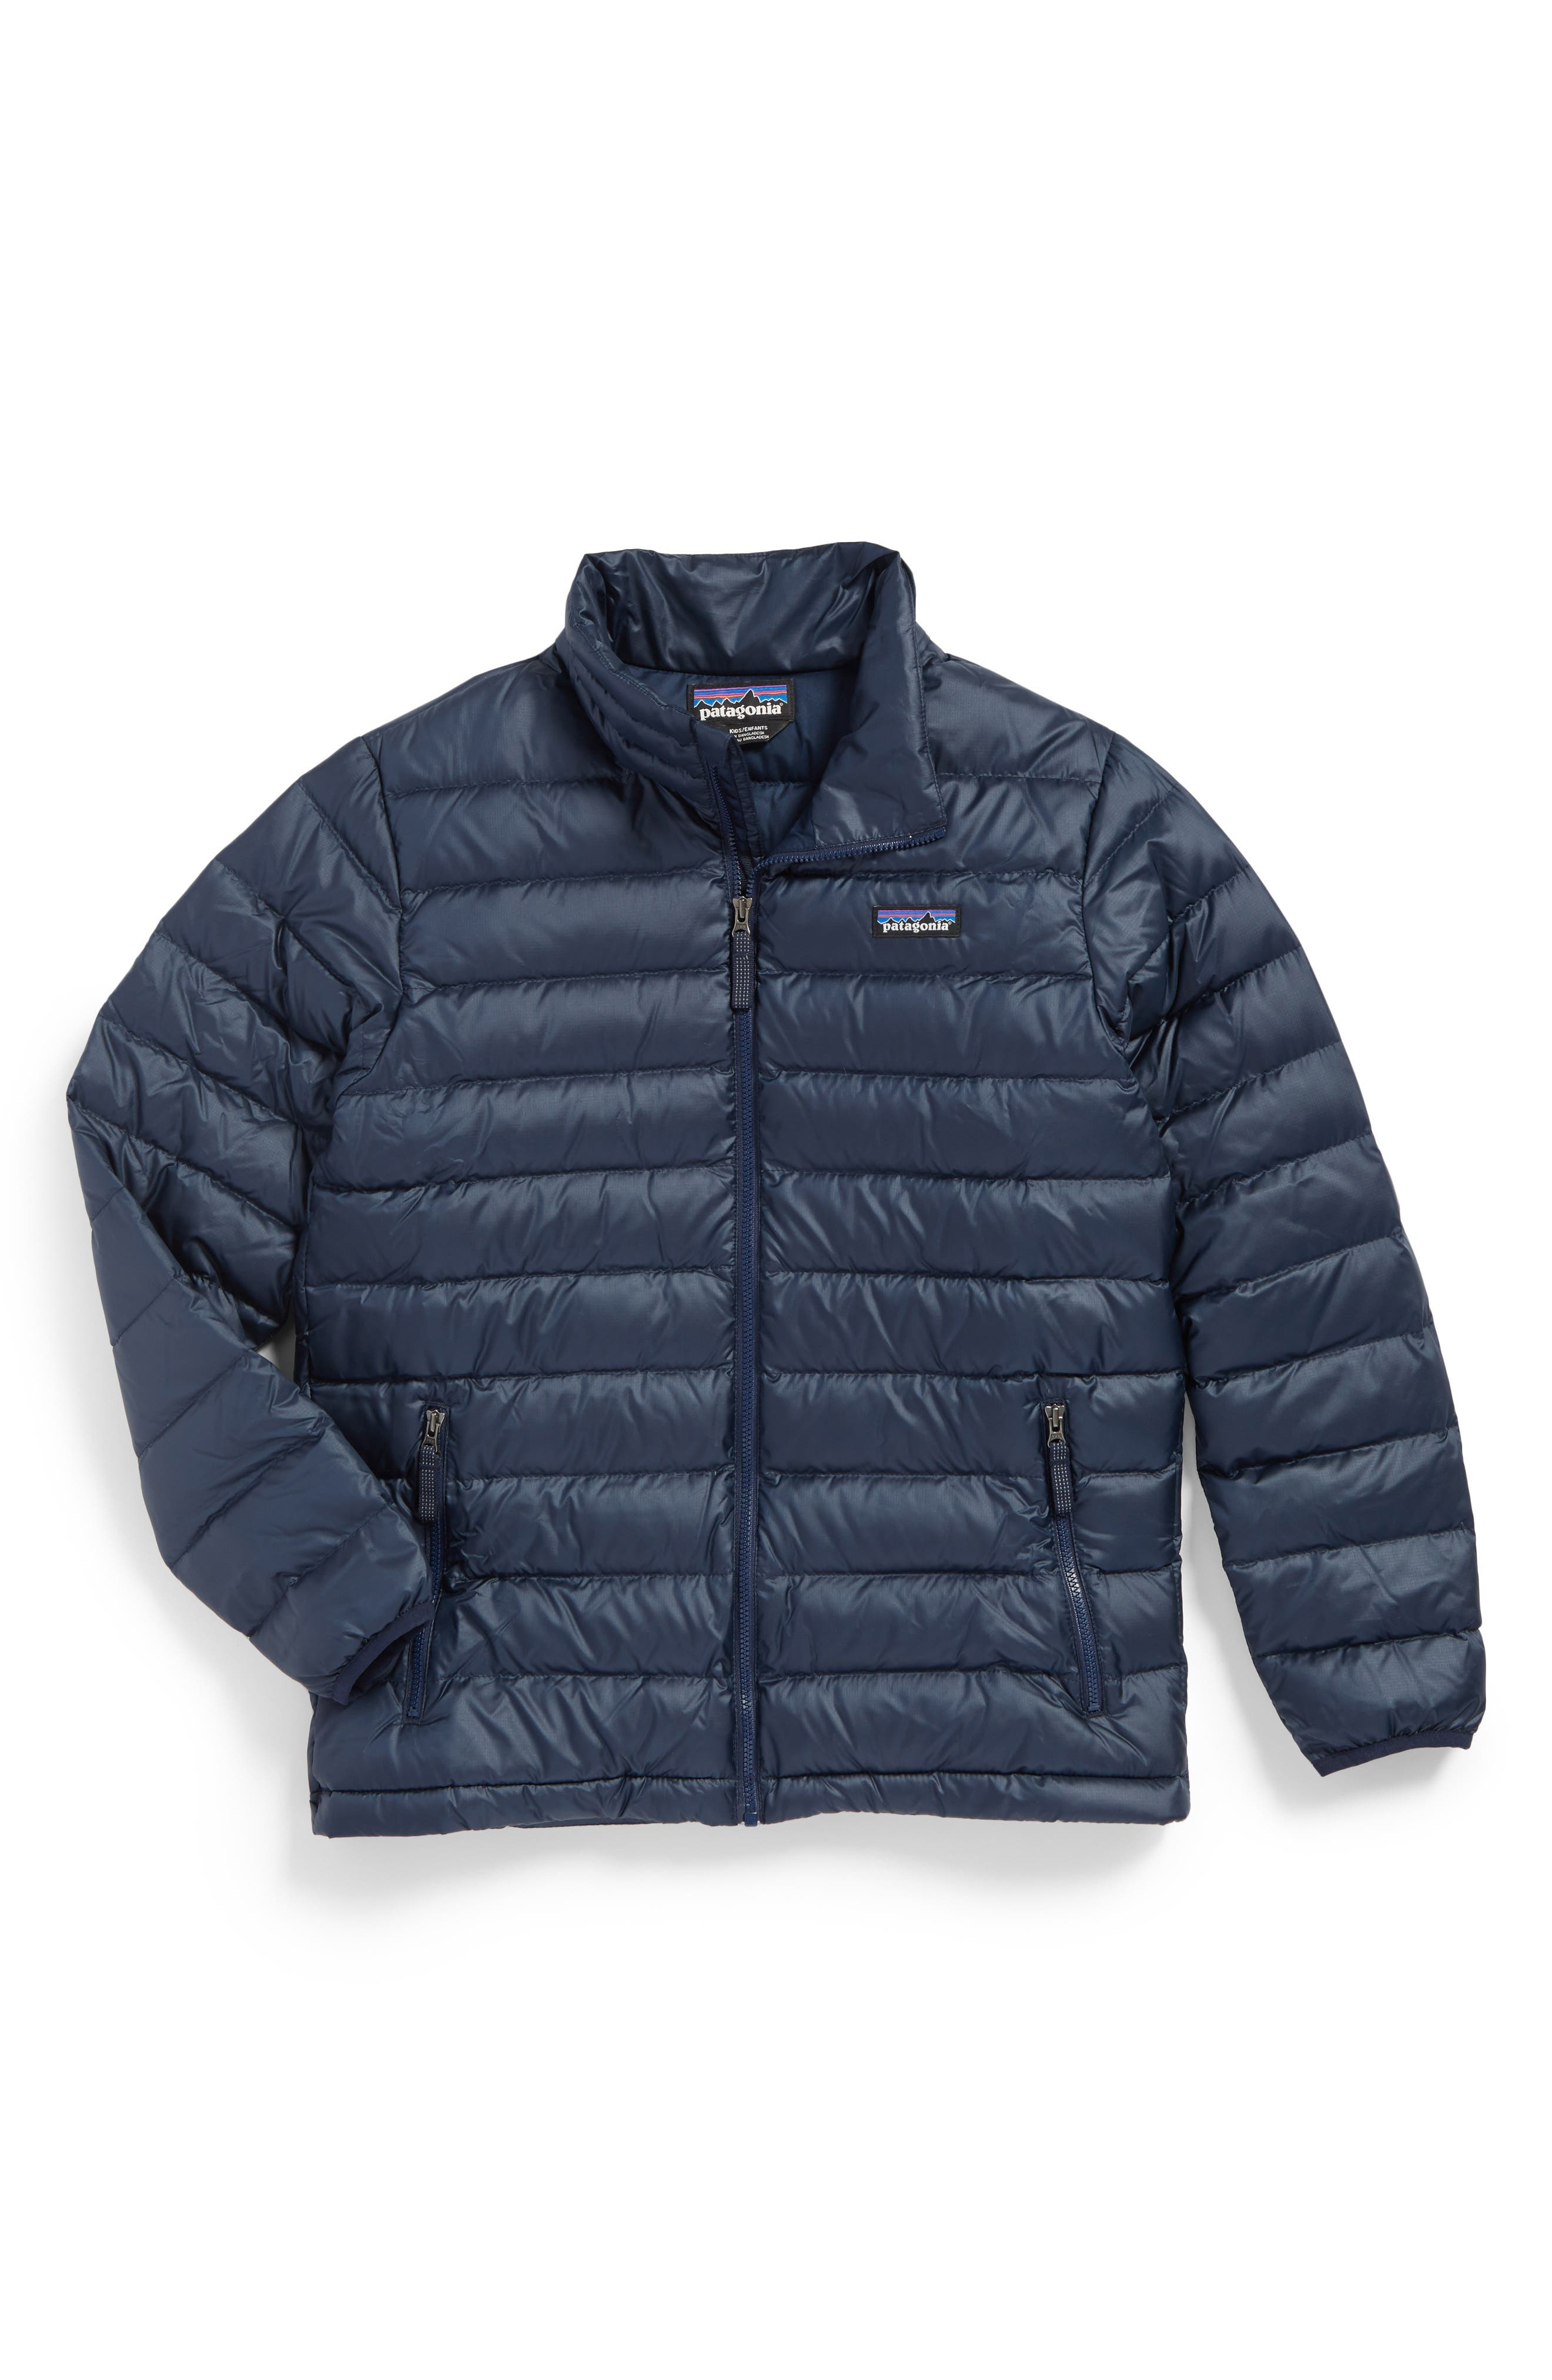 blue sweater | Nordstrom